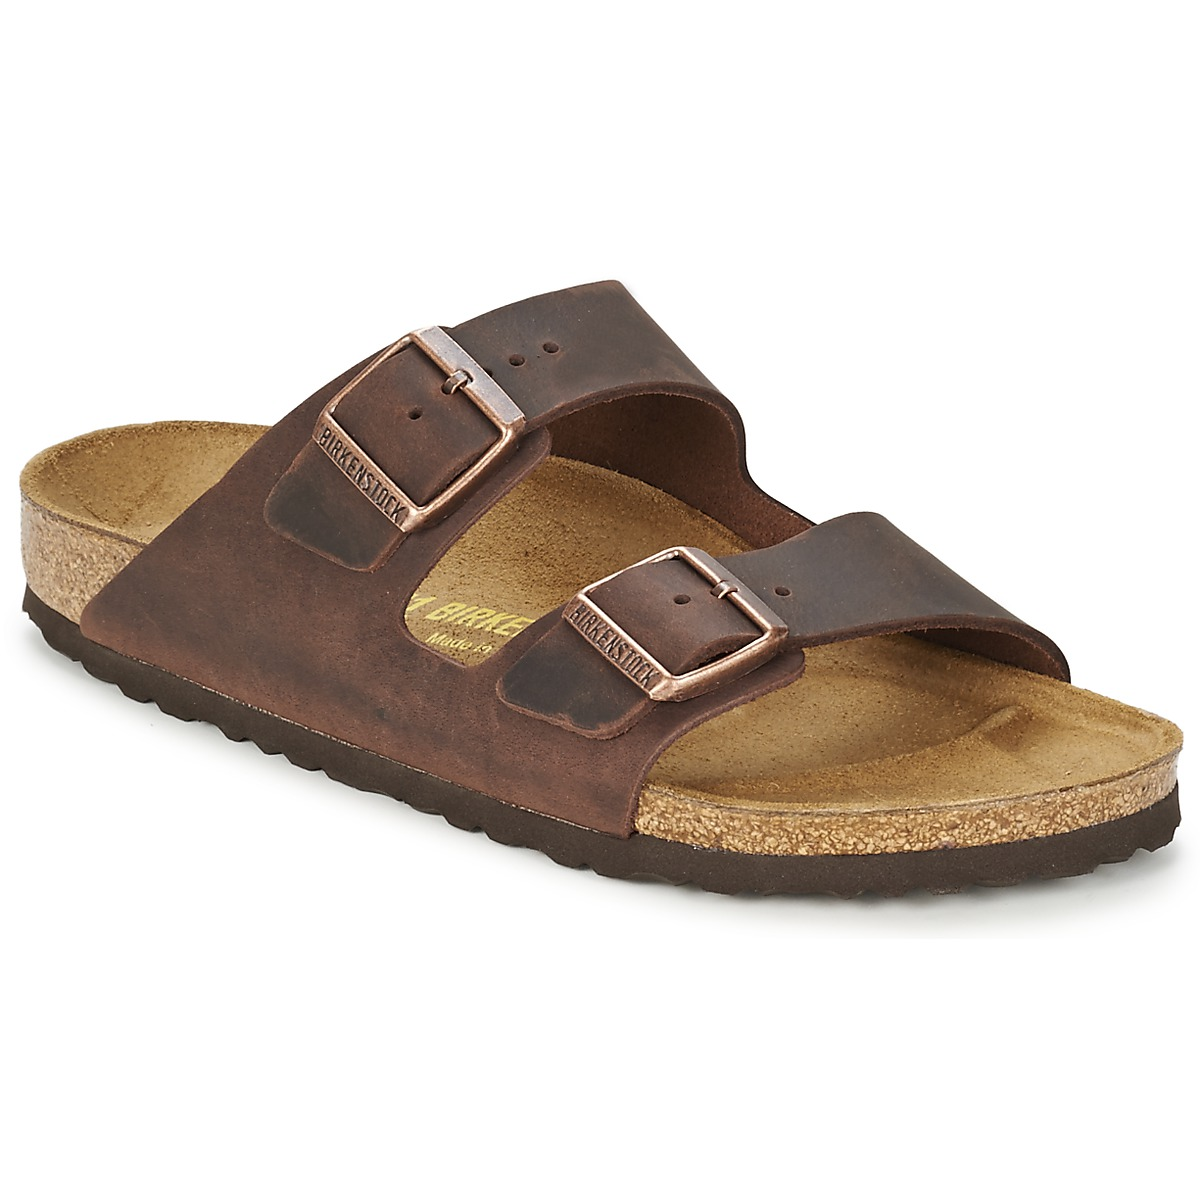 Chaussures Birki's marron unisexe Naturino Bomba Fan Rettile Lam. Passion Platino Multi Sneaker Velcro Bambina YD0YS